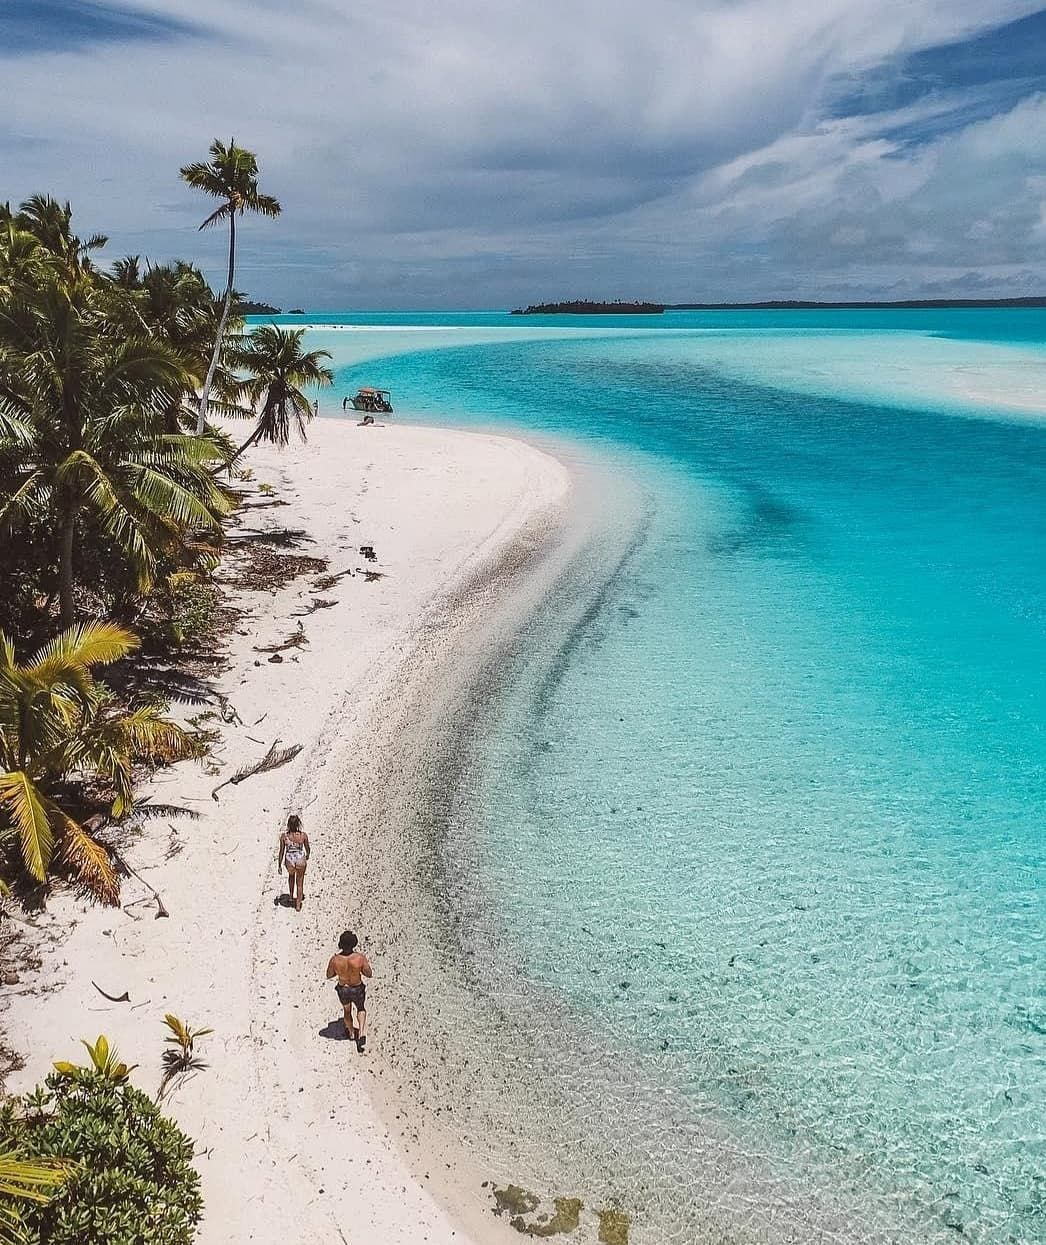 Cook Islands Rarotonga Beach: Beach Escape In Paradise... 🏝 📍Aitutaki, Cook Islands 📷 By